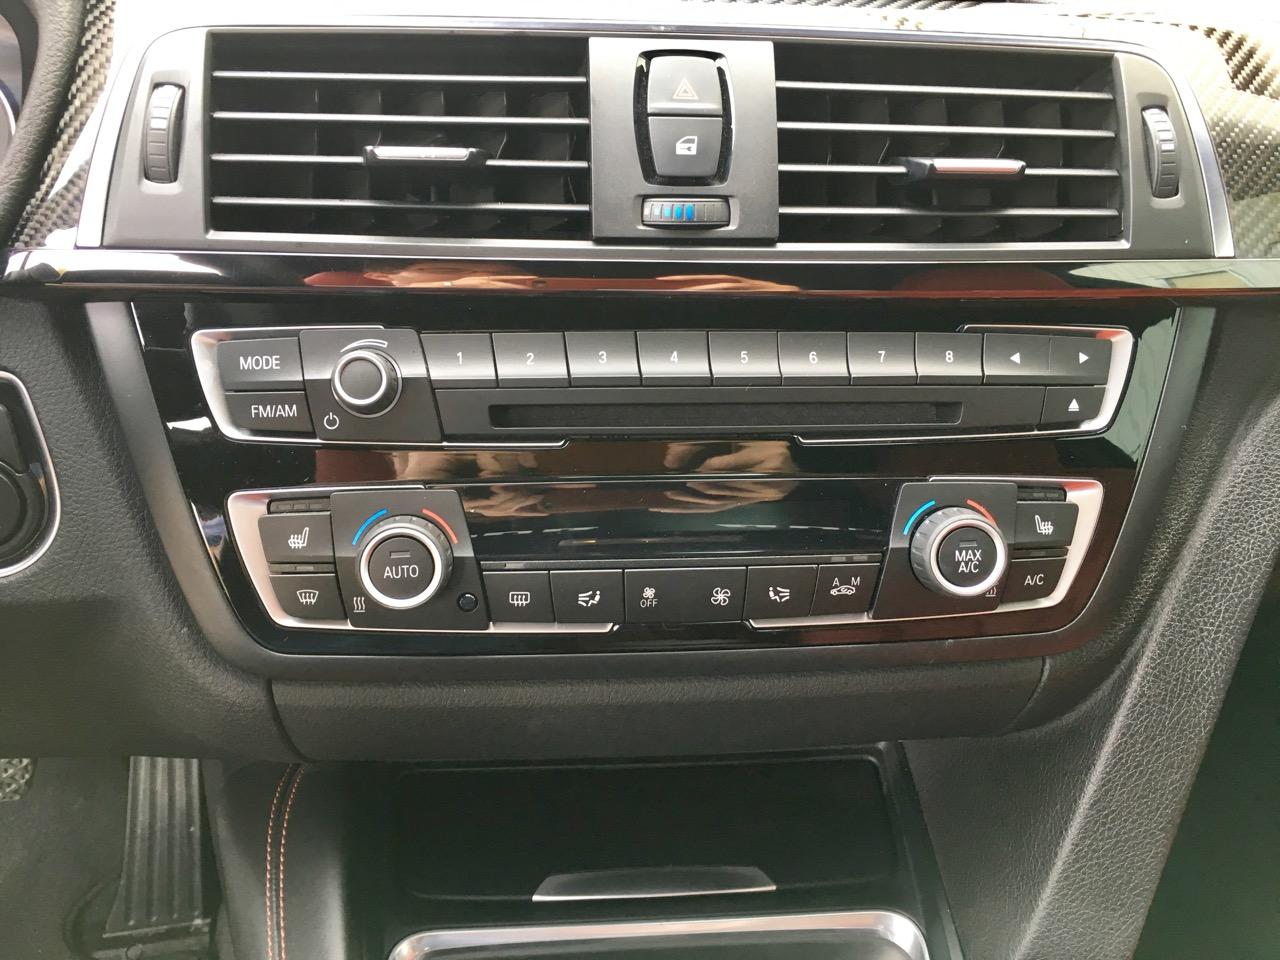 2016 BMW M4 (GK337541) - 16.jpg